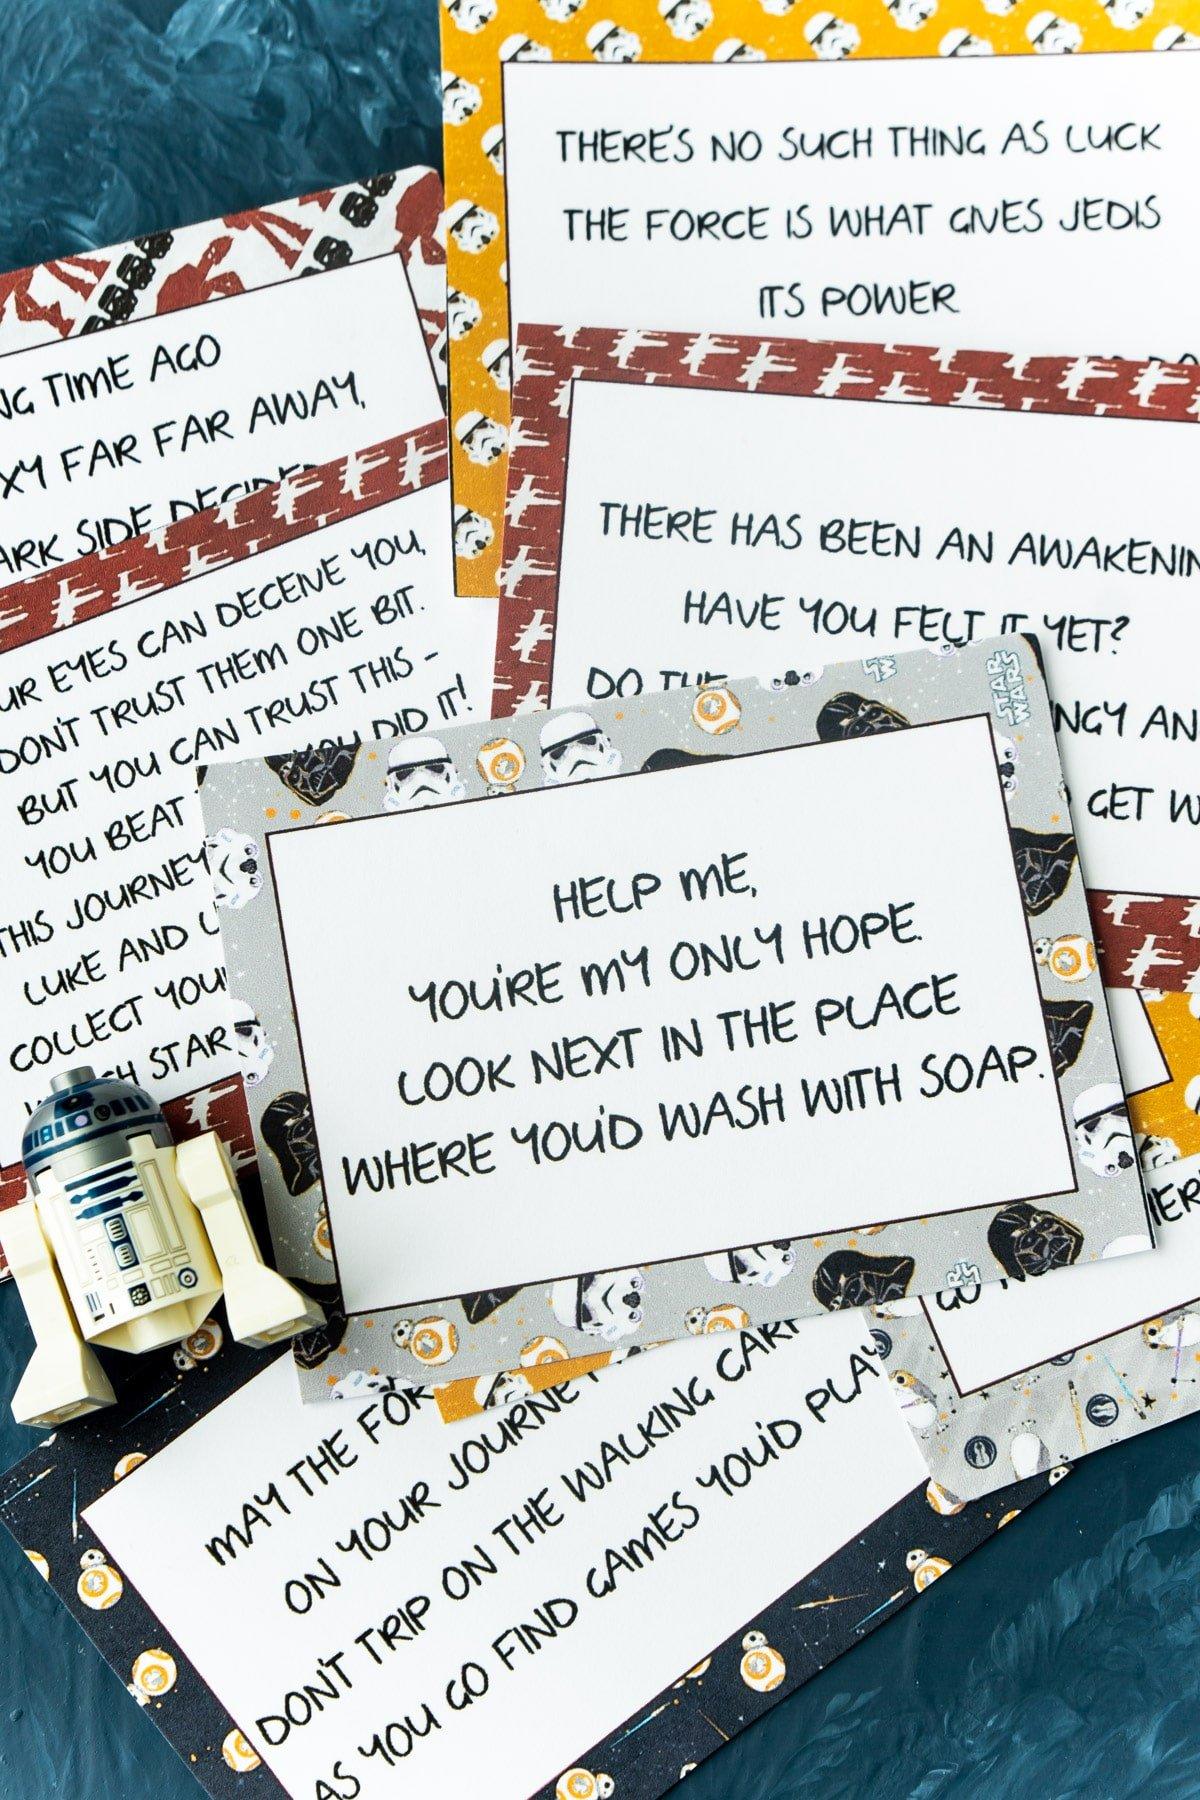 Pile of Star Wars scavenger hunt clues